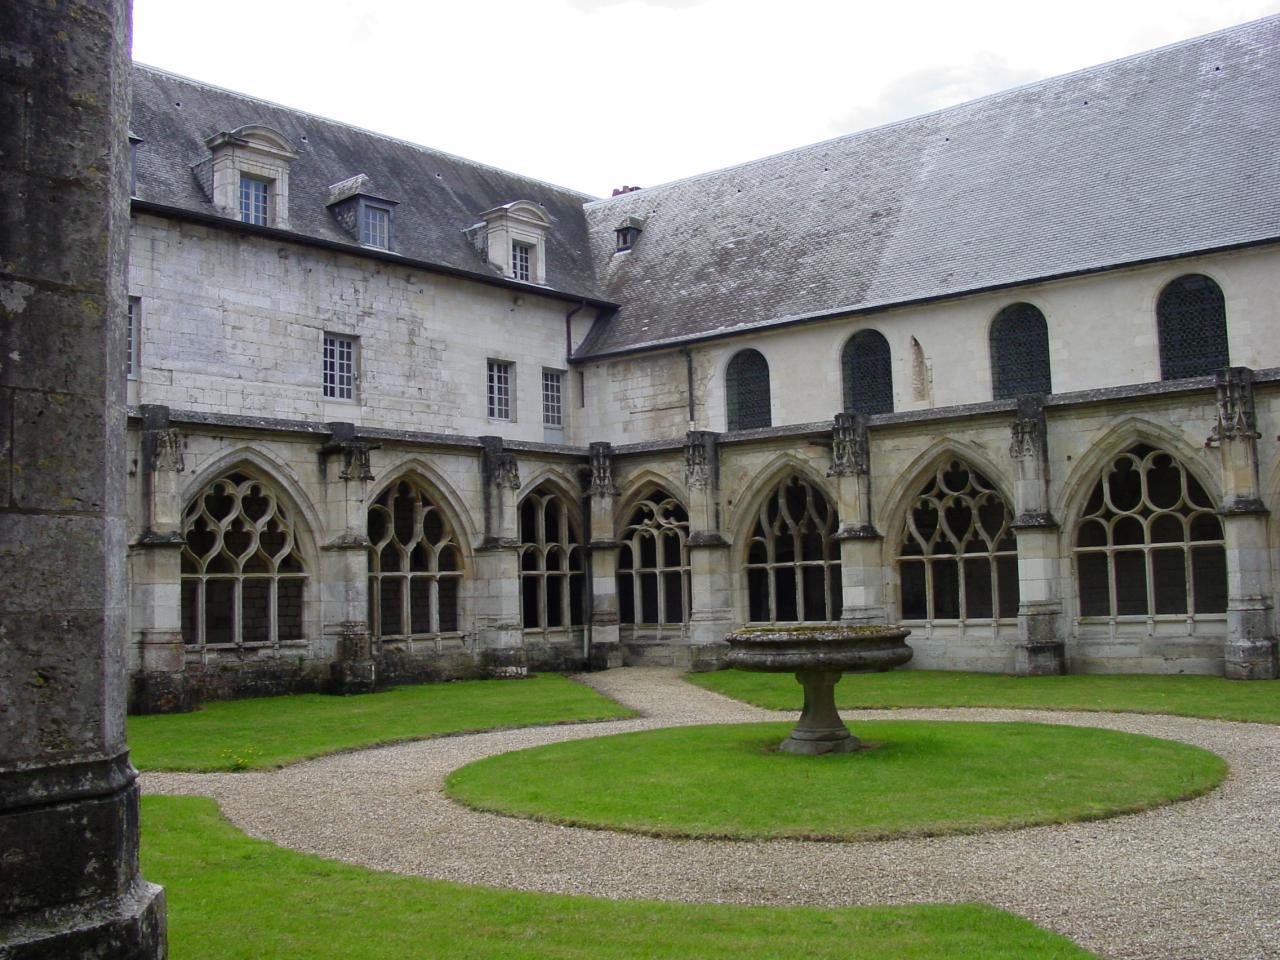 Abbaye Notre-Dame du Bec, Le Bec Hellouin (27) - 04/2004